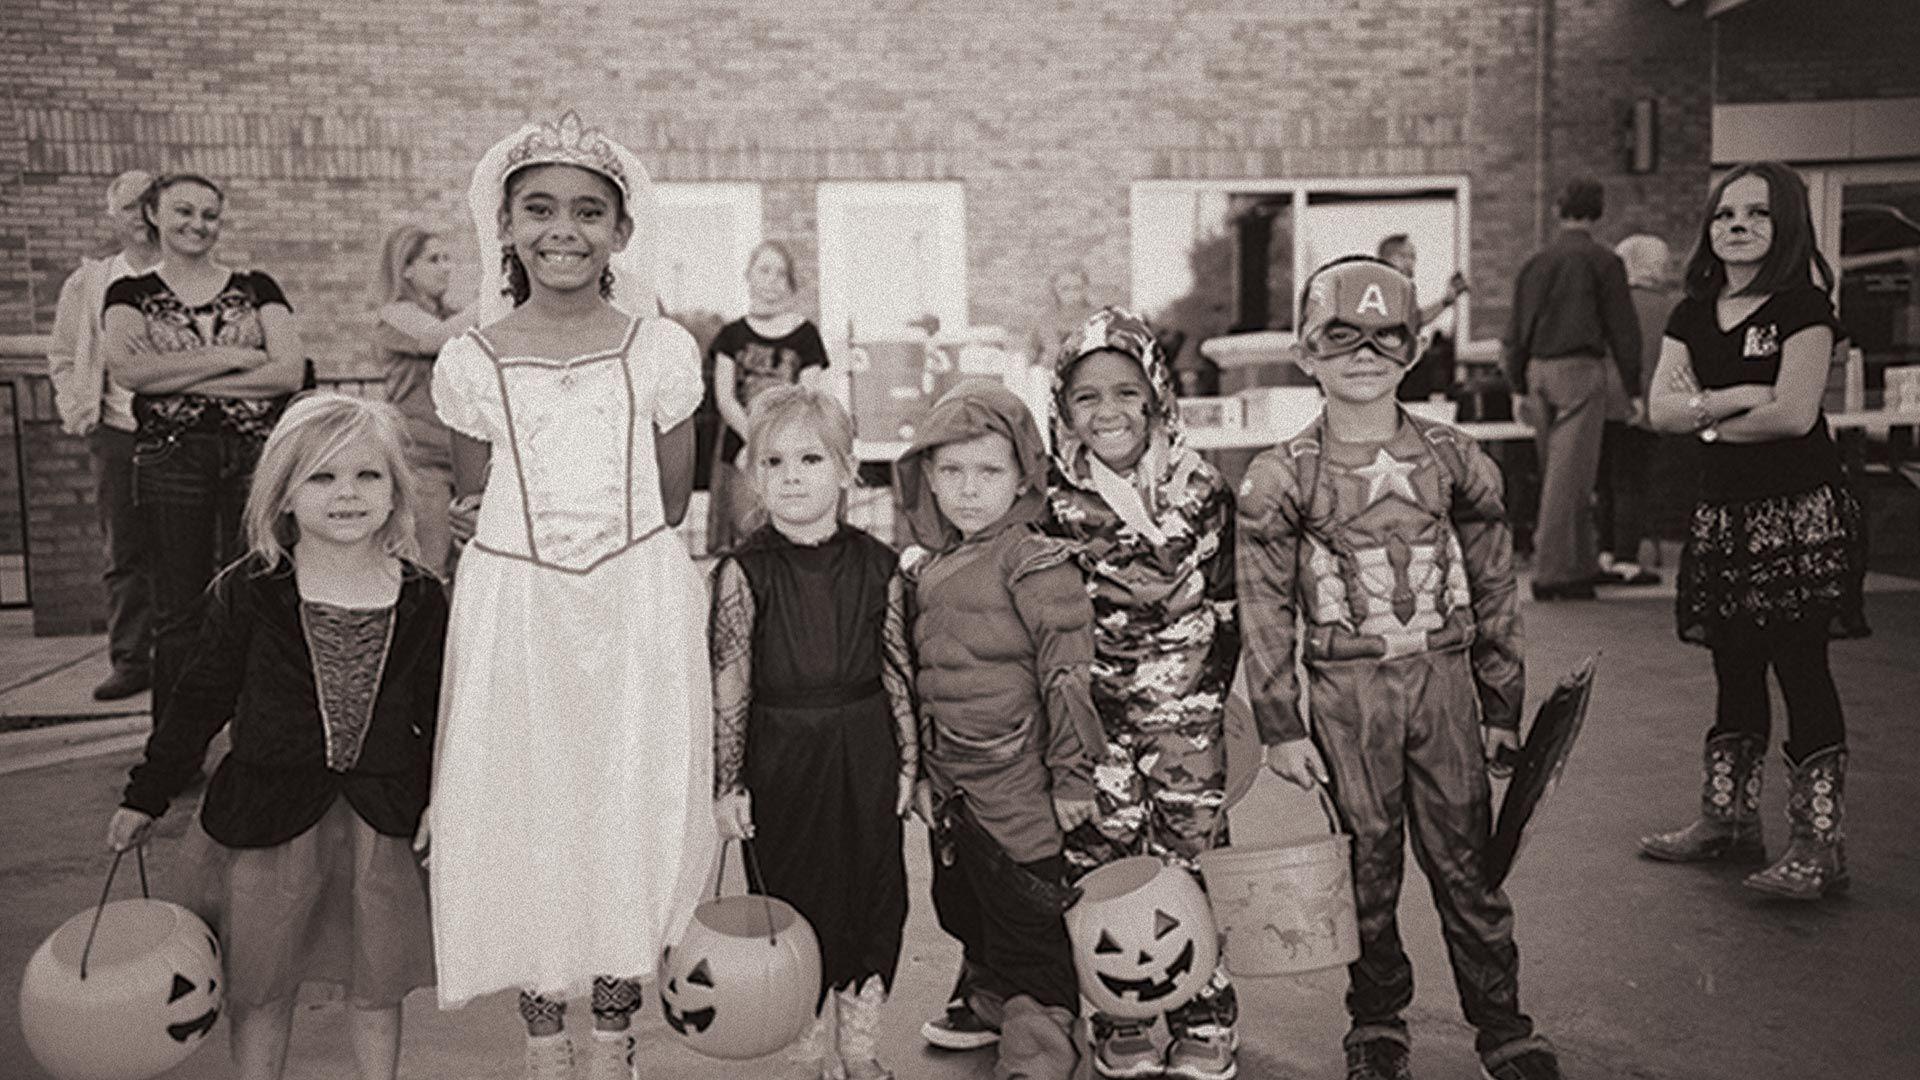 Halloweekend Costa Mesa Orange County Halloween